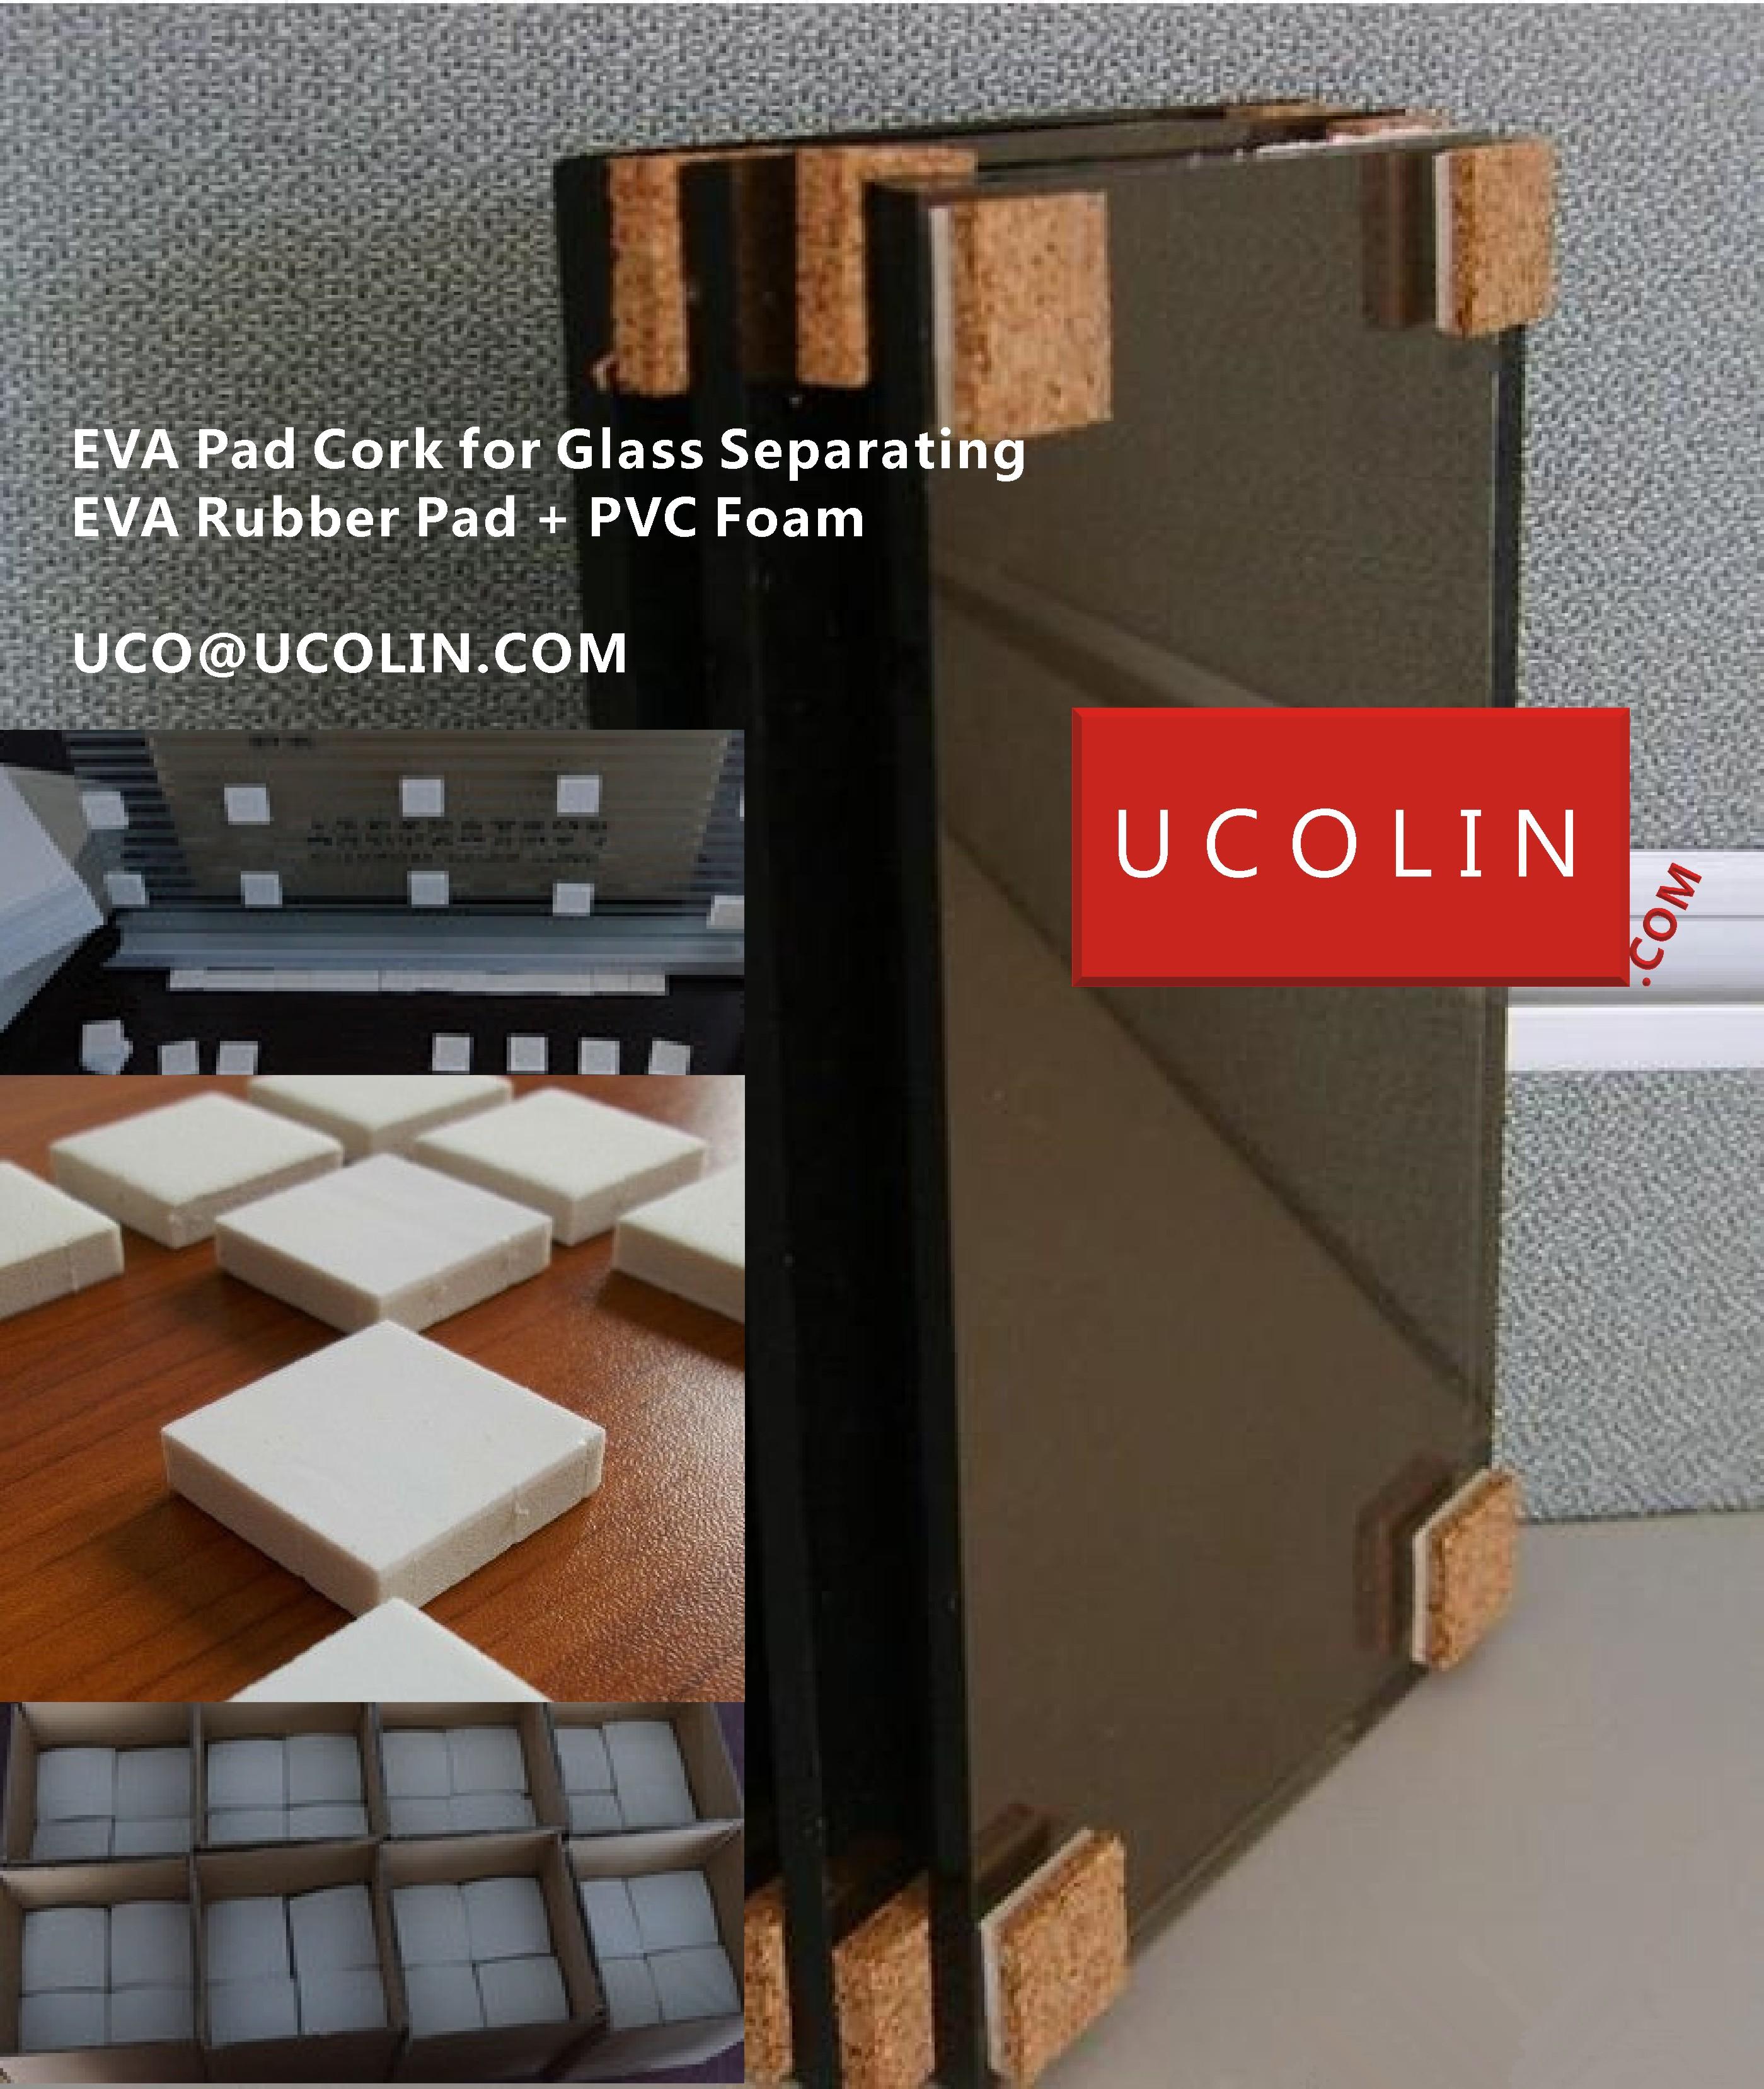 EVA Cork Pad for Glass Separating